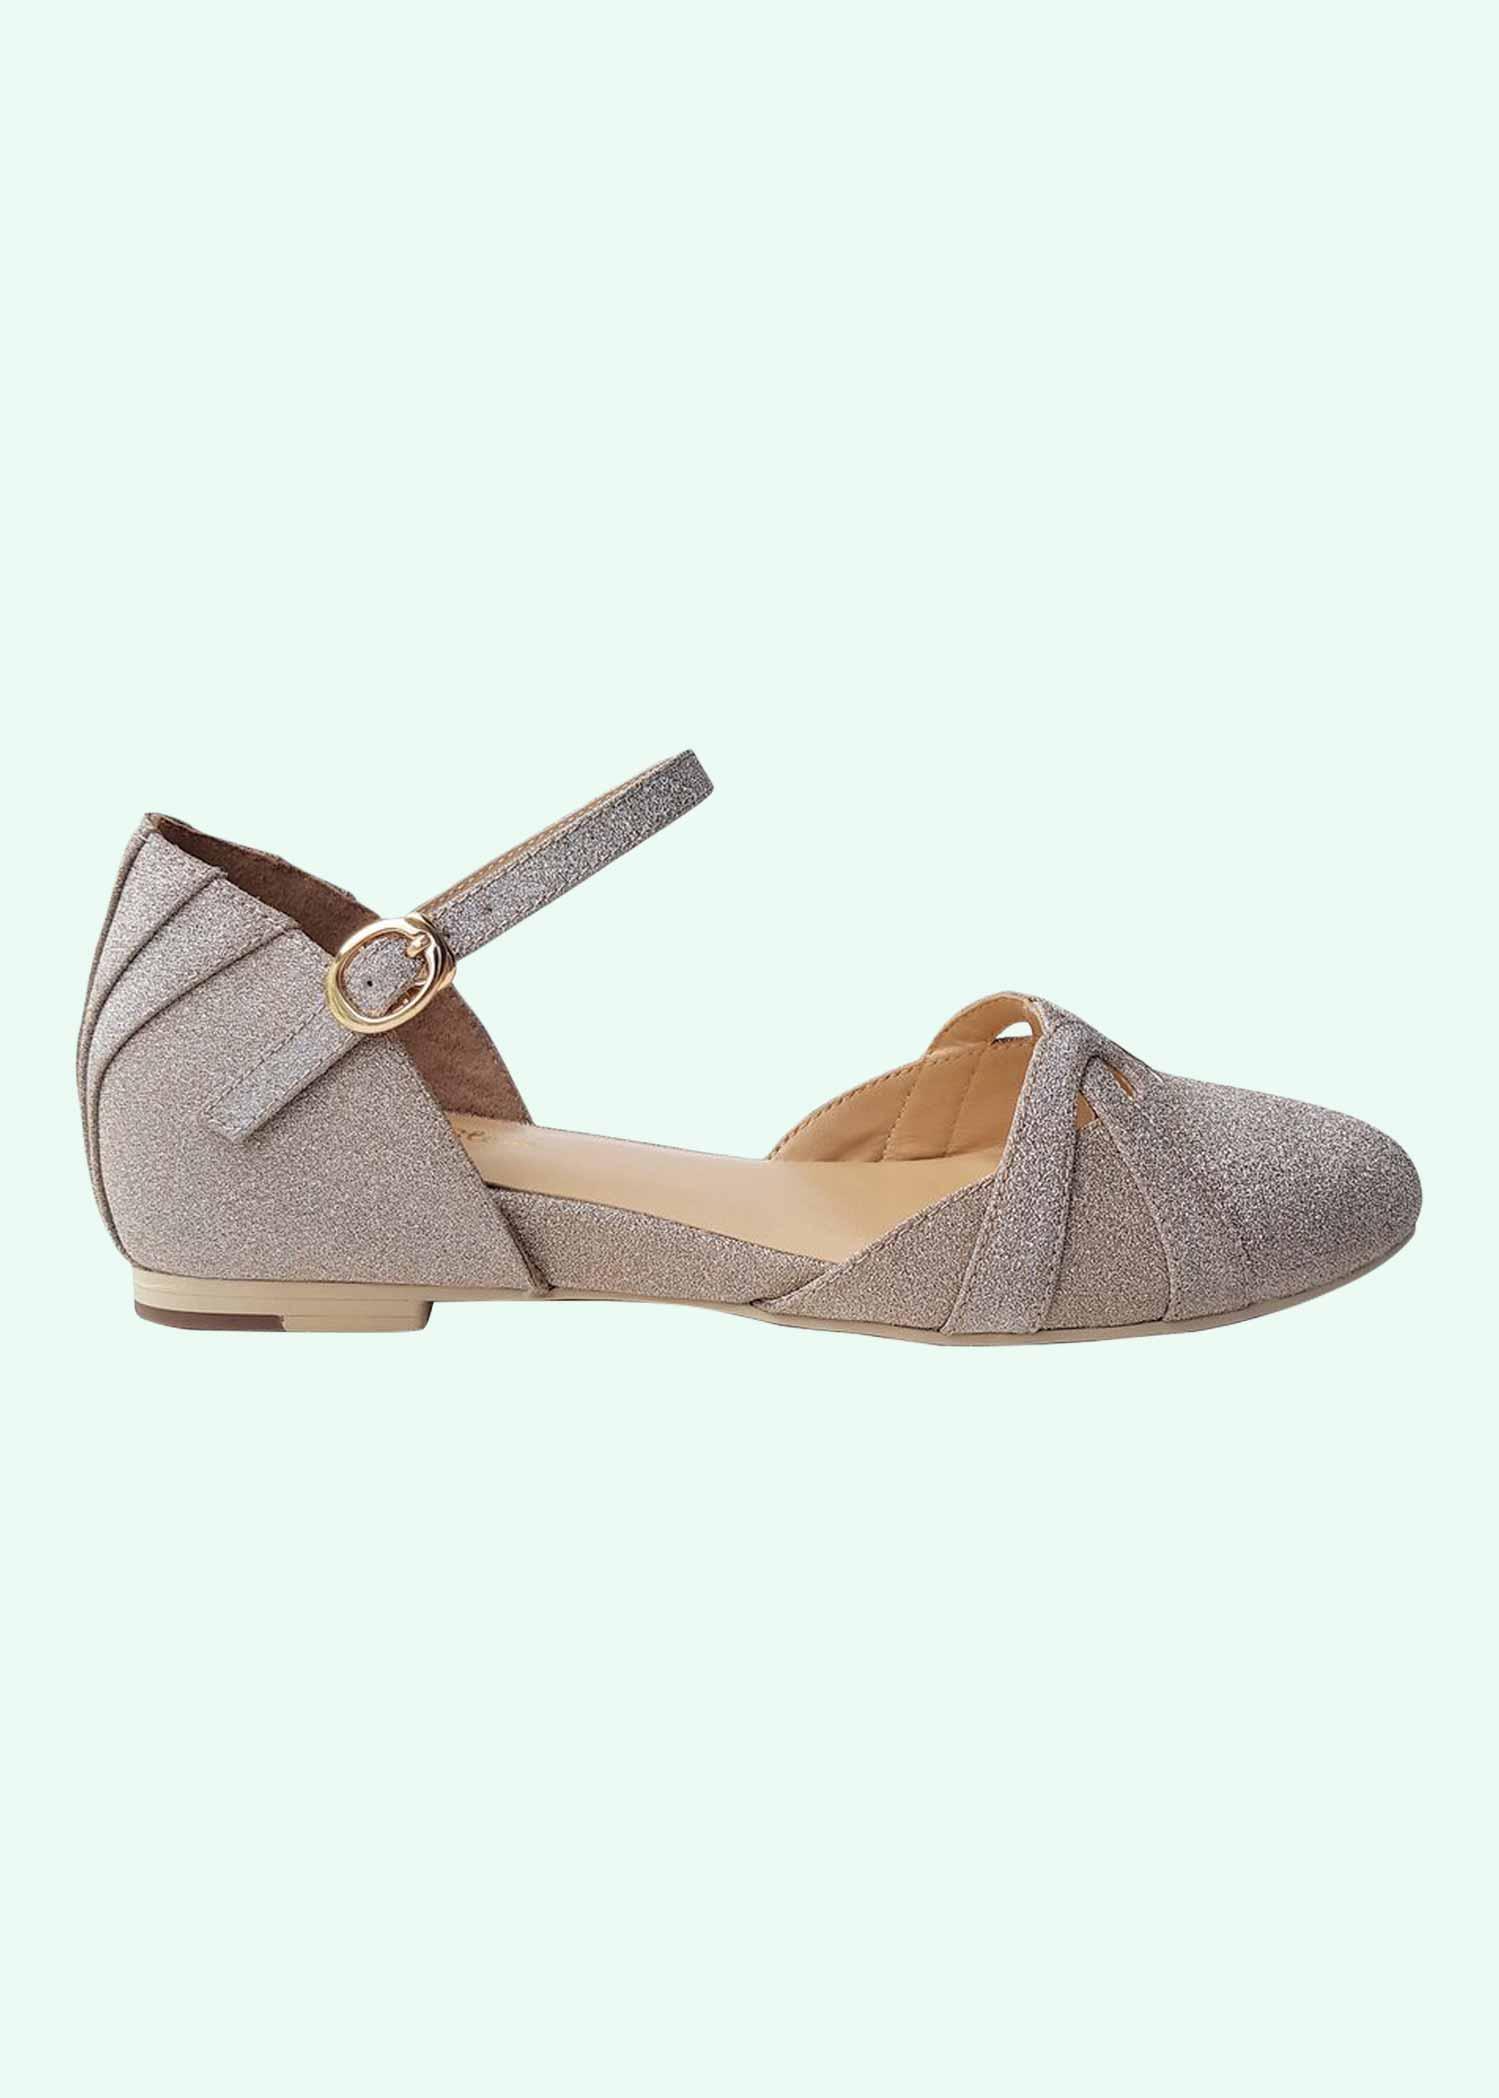 Limited edition sko fra Charlie Stone